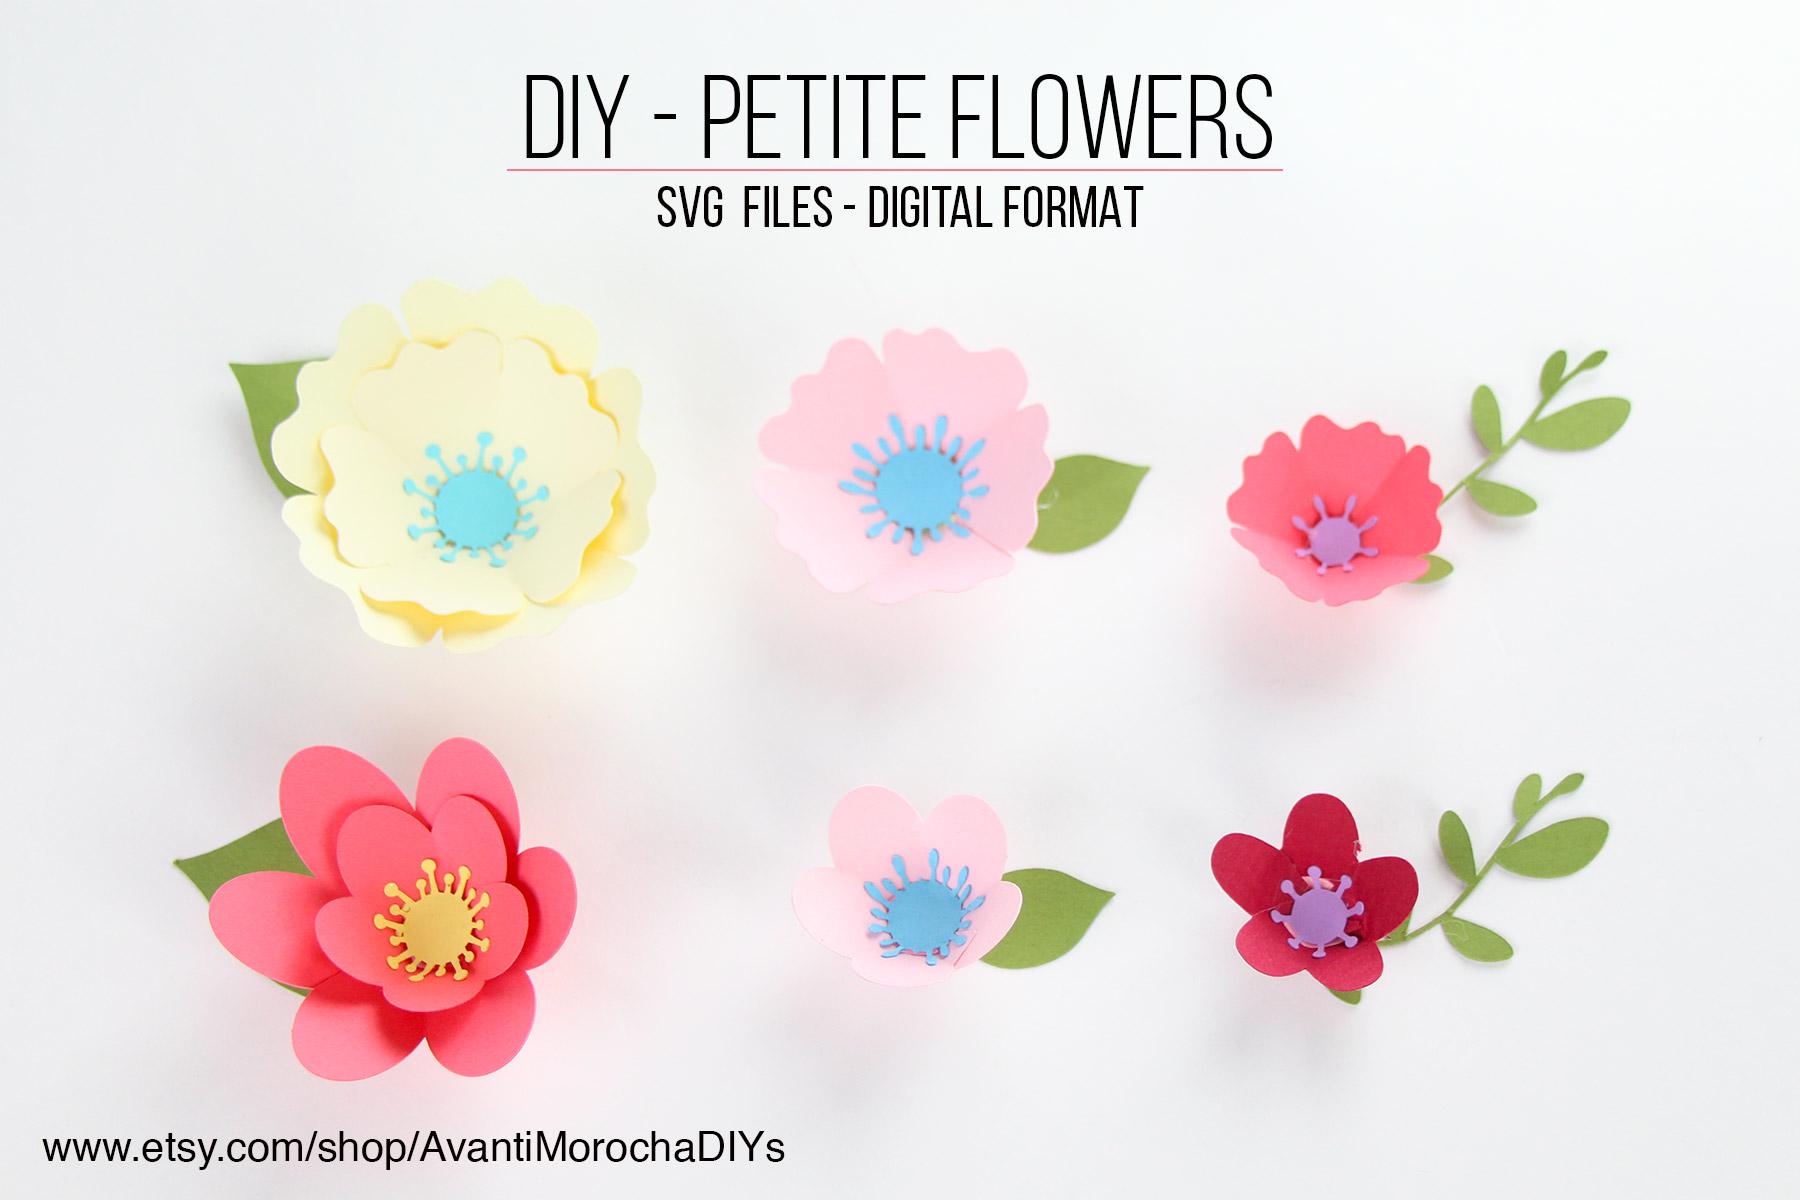 Petite Flowers - Etsy